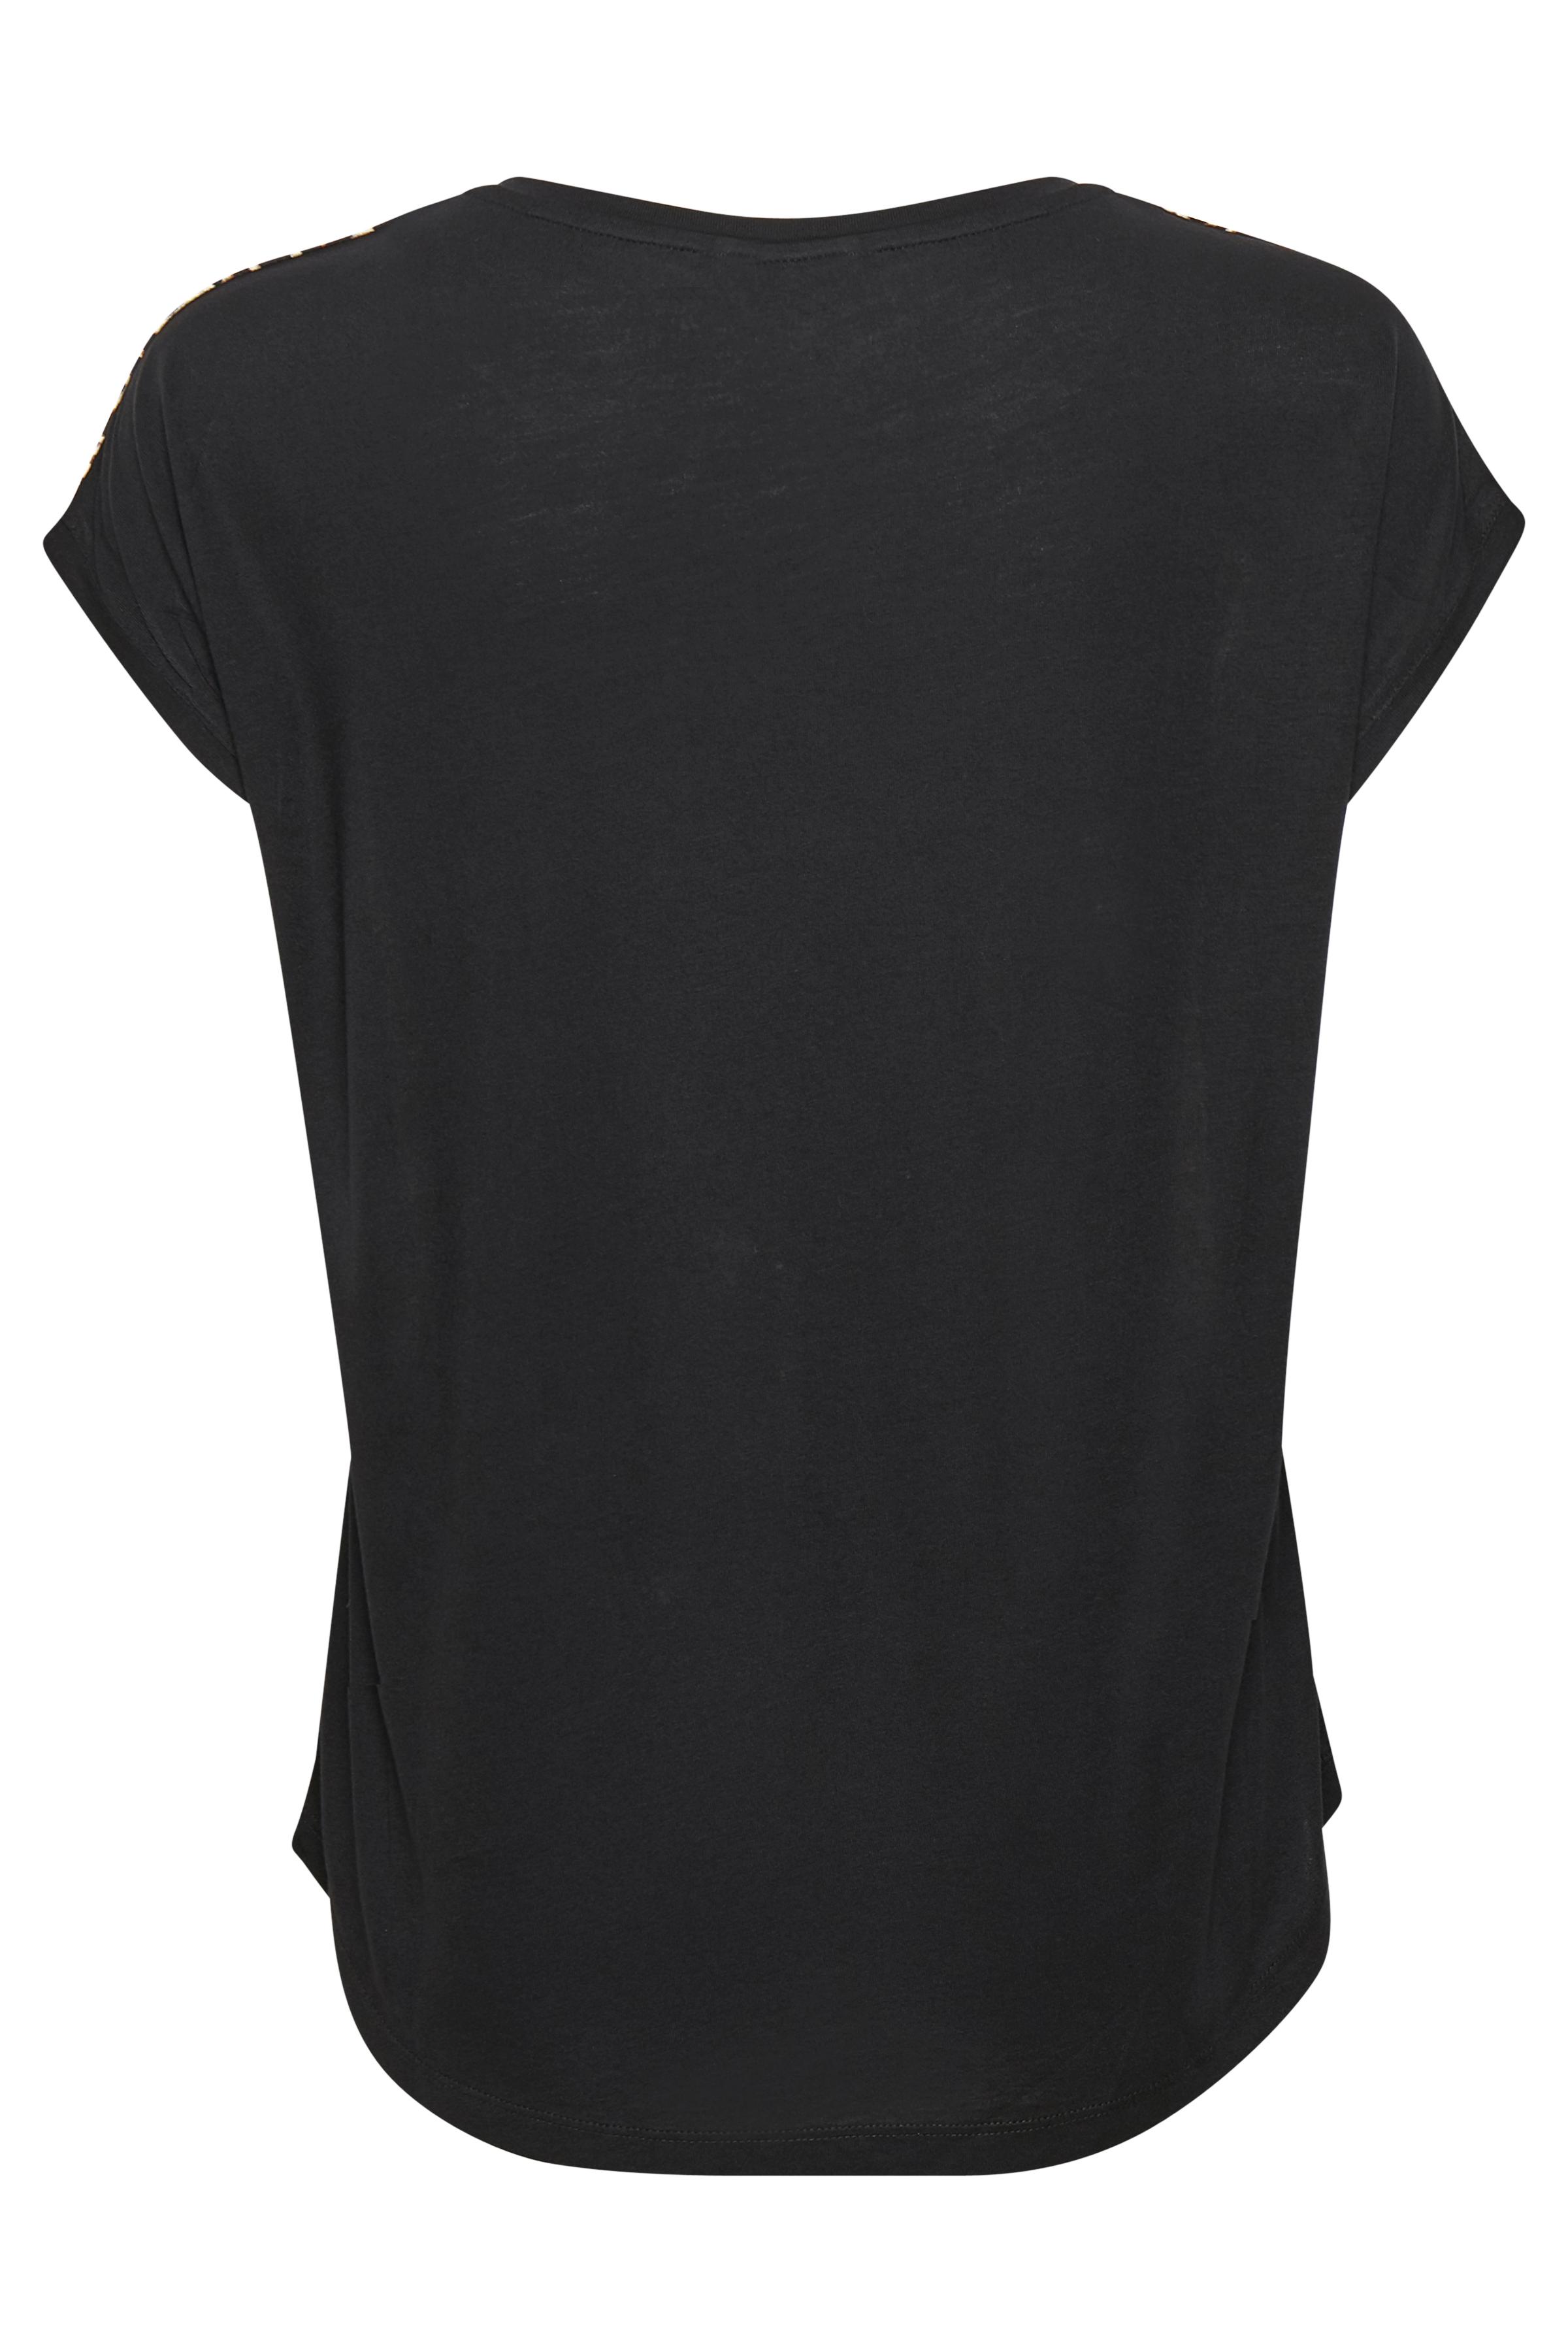 Crème/zwart Korte mouwen shirt  van Bon'A Parte – Door Crème/zwart Korte mouwen shirt  van maat. S-2XL hier